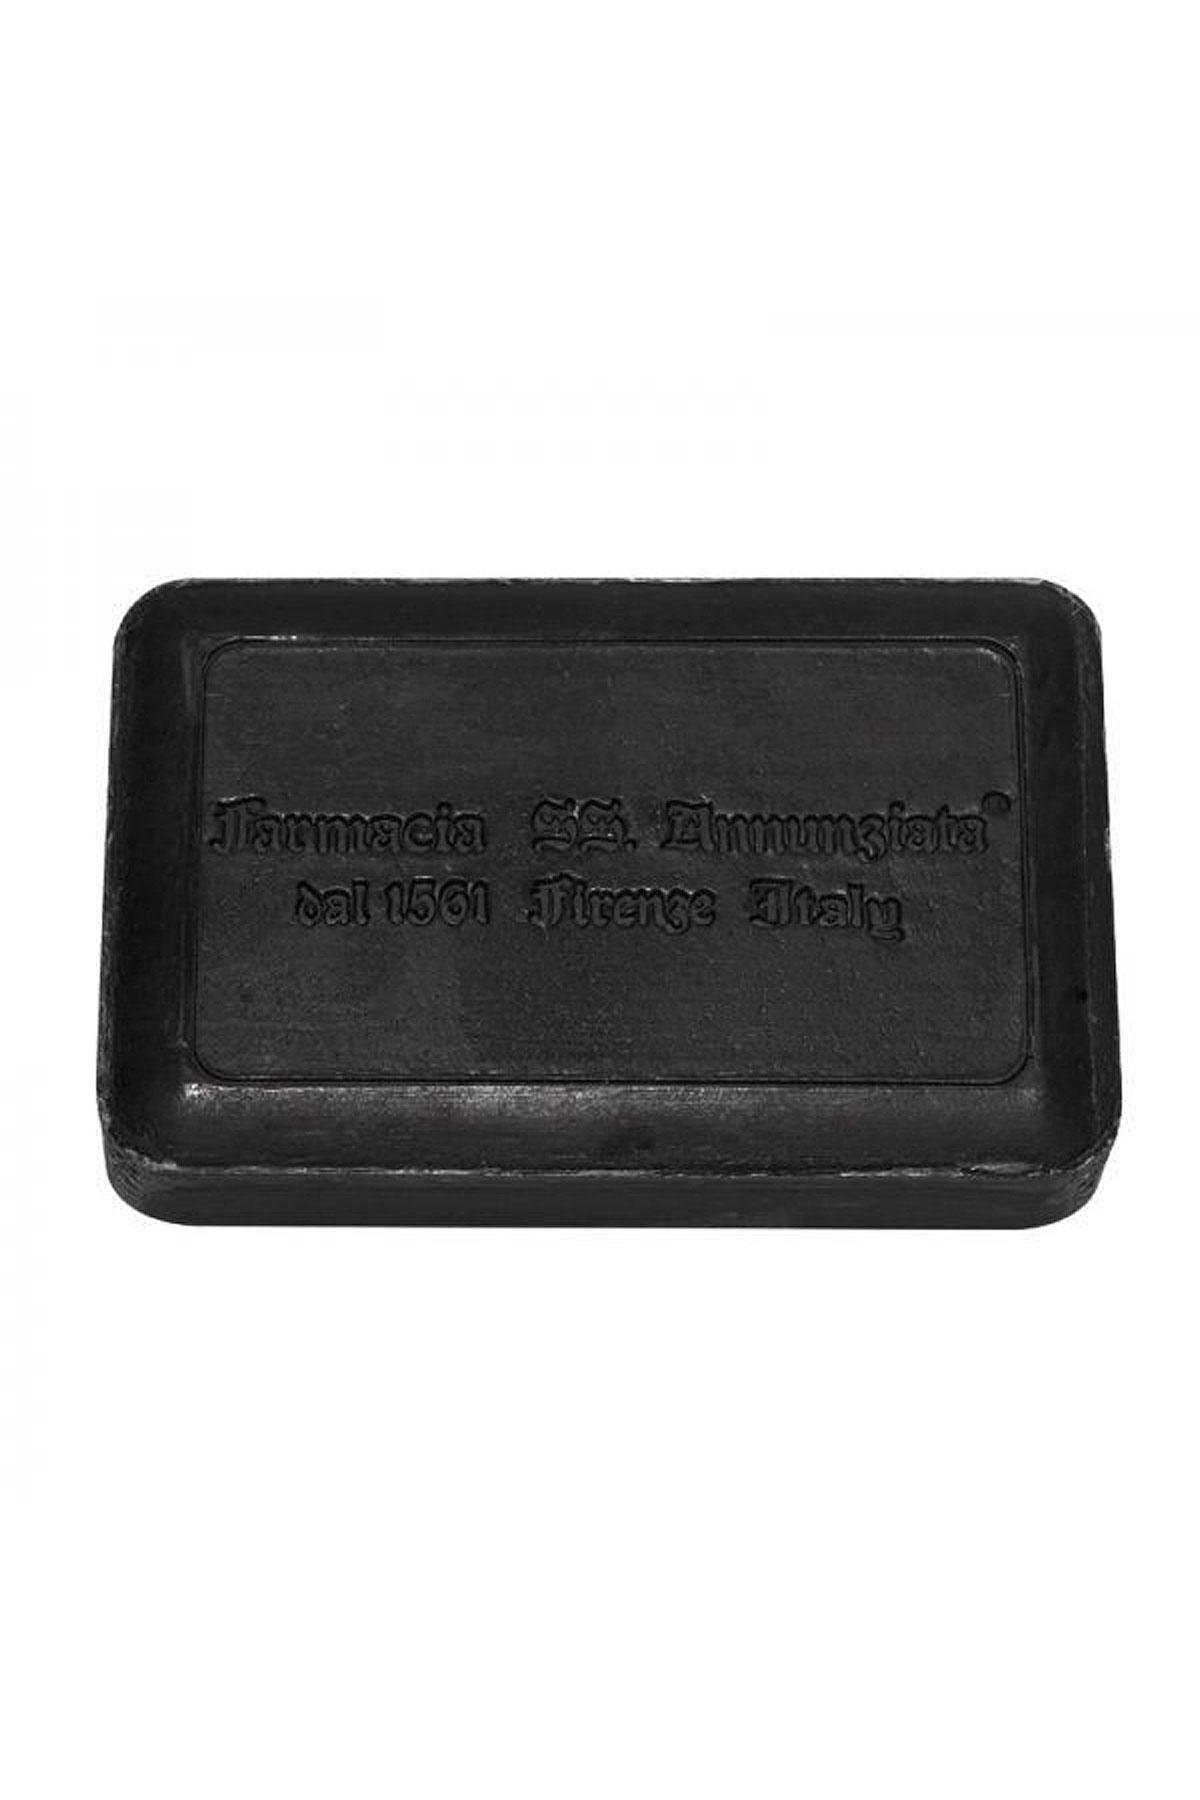 Farmacia Ss Annunziata 1561 Beauty for Men On Sale, Takis - Soap - 150 Gr, 2019, 150 gr